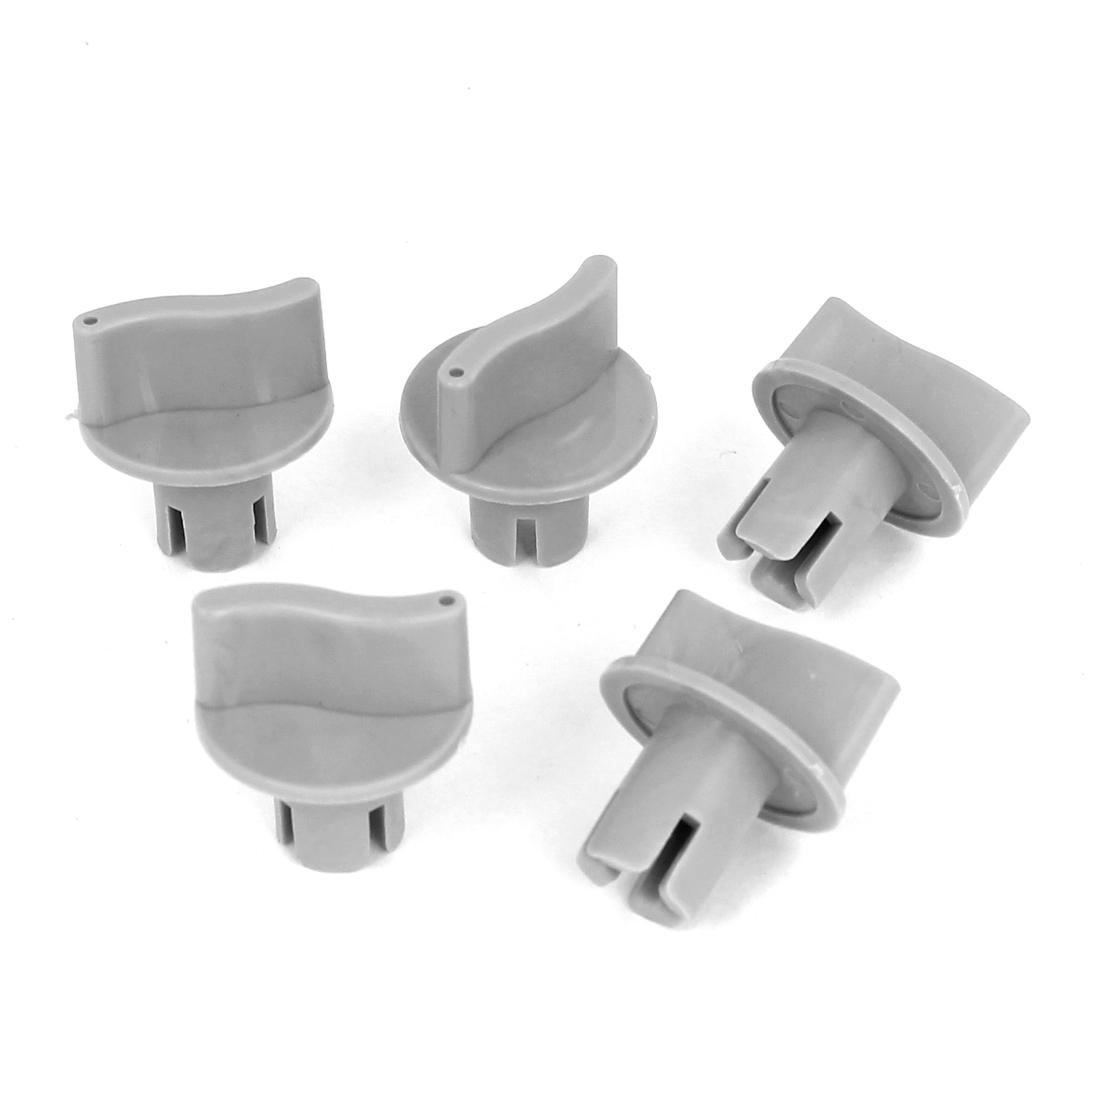 Washing Machine Part 6mm ID Cross Slot Hard Plastic Timer Turning Knob Gray 5pcs